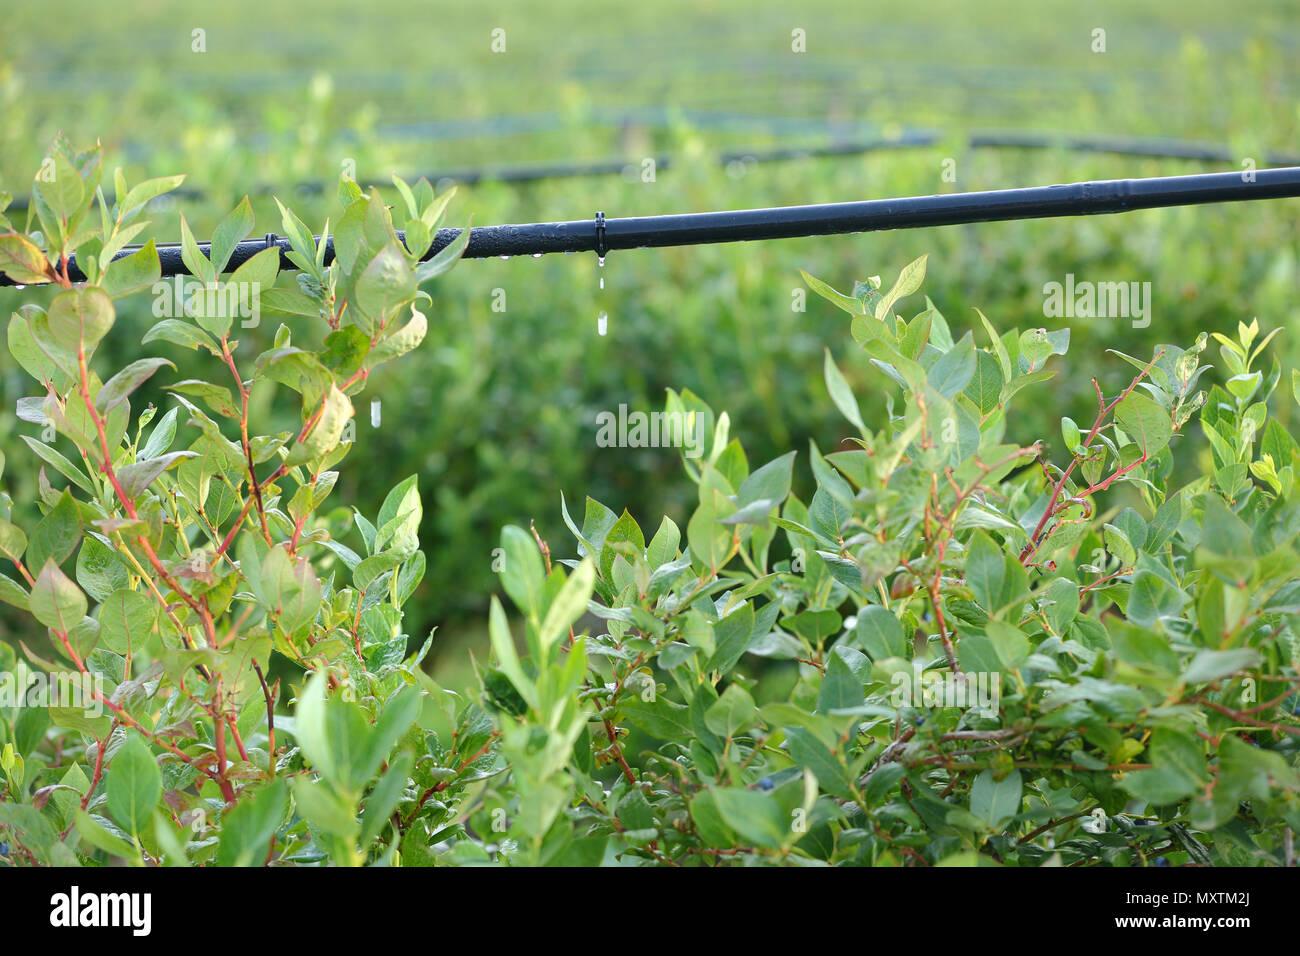 Drip Irrigation Stock Photos & Drip Irrigation Stock Images